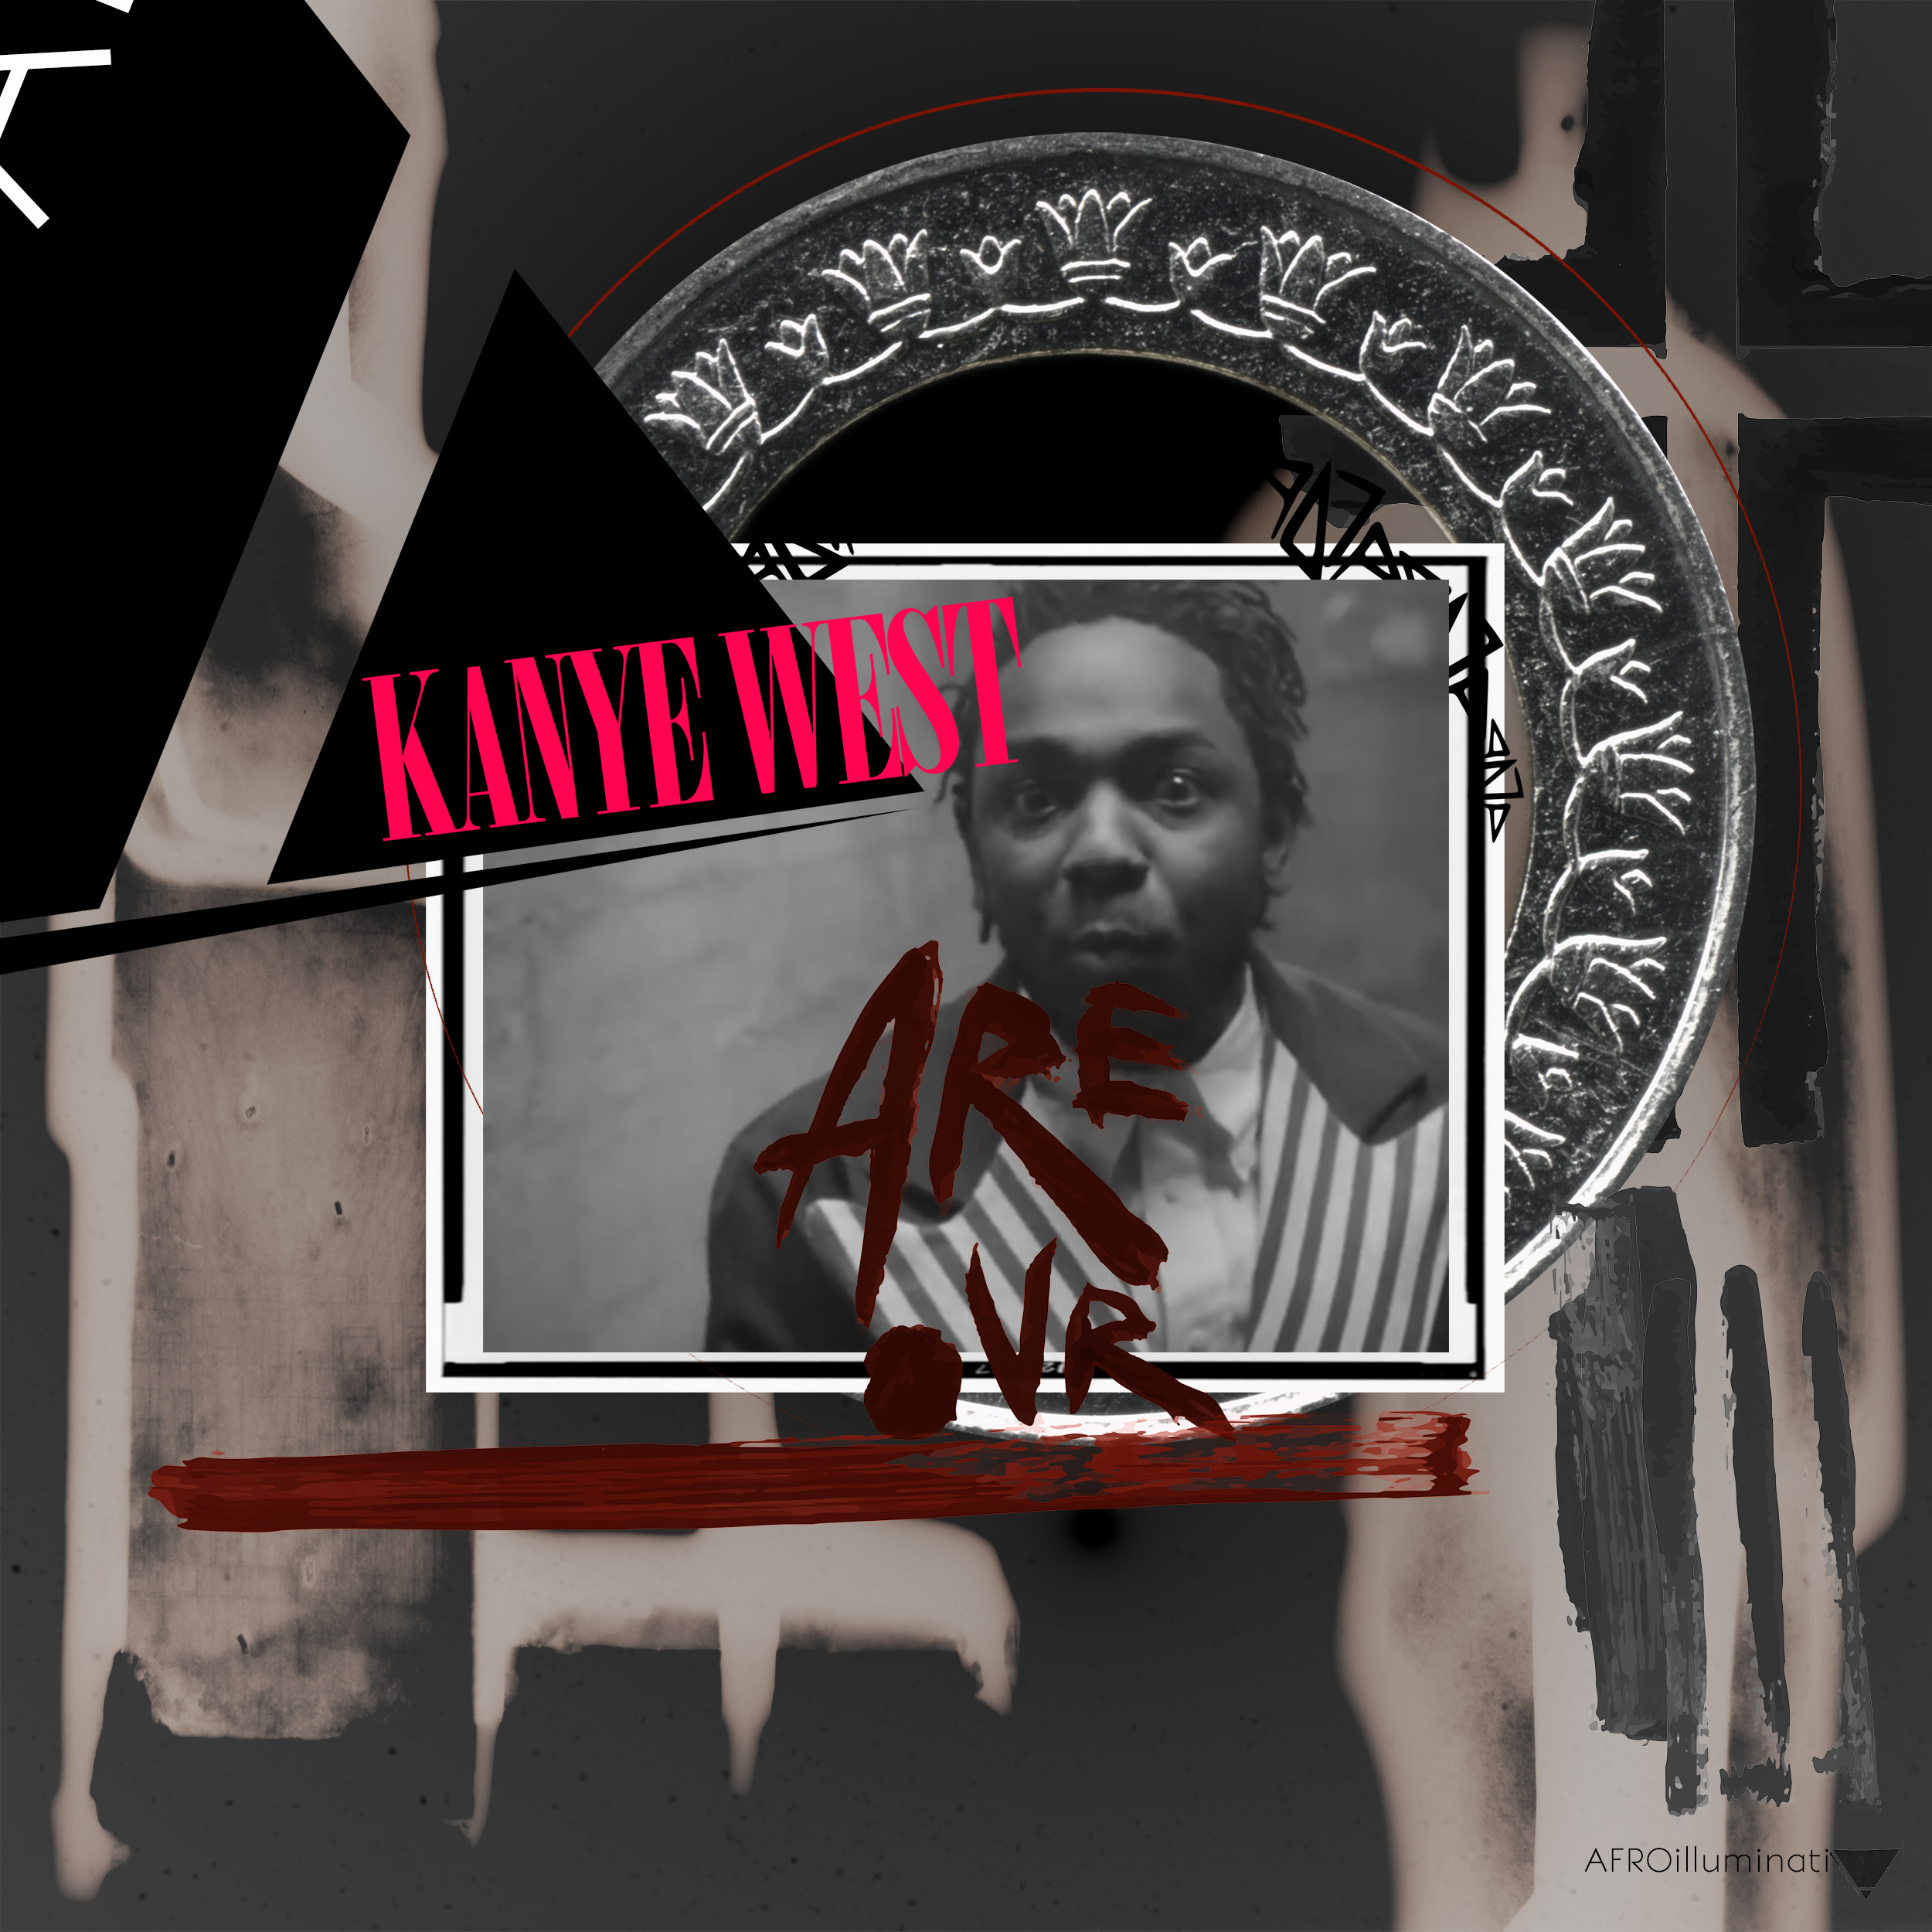 SATURDAY NIGHT SPECIAL 4 AI Kendrick Lamar KANYE WEST and HORUS.jpg